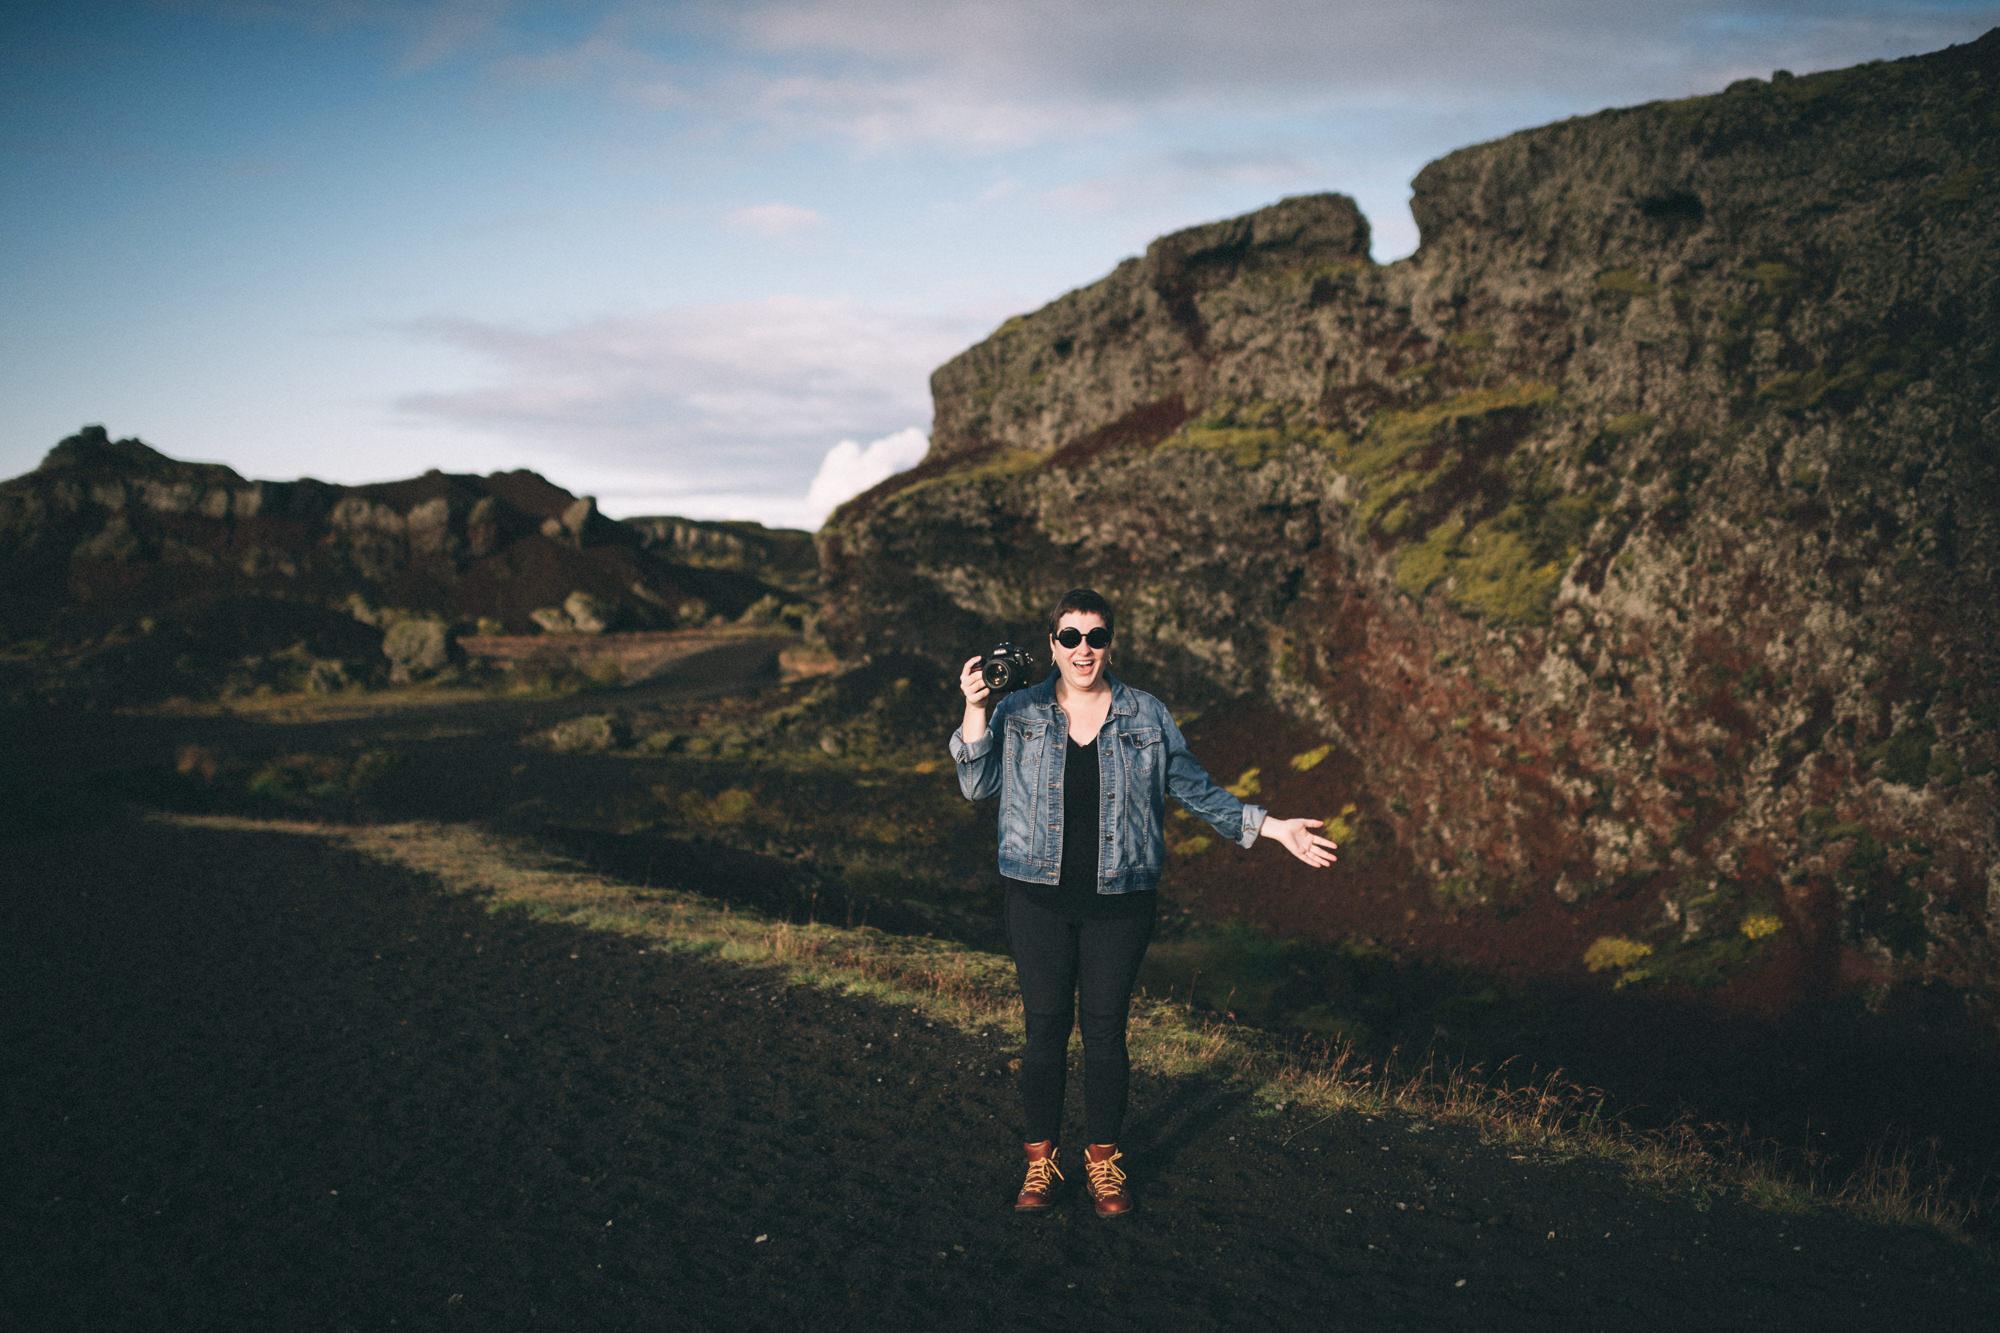 Sarah-Katherine-Davis-Photography-Iceland-Adventure-Elopement-Photographer-Louisville-Kentucky-Wedding-Photographer-Travel-Vik-Beach-Engagement-Session-Cozy-Iceland-South-Coast-32edit.jpg